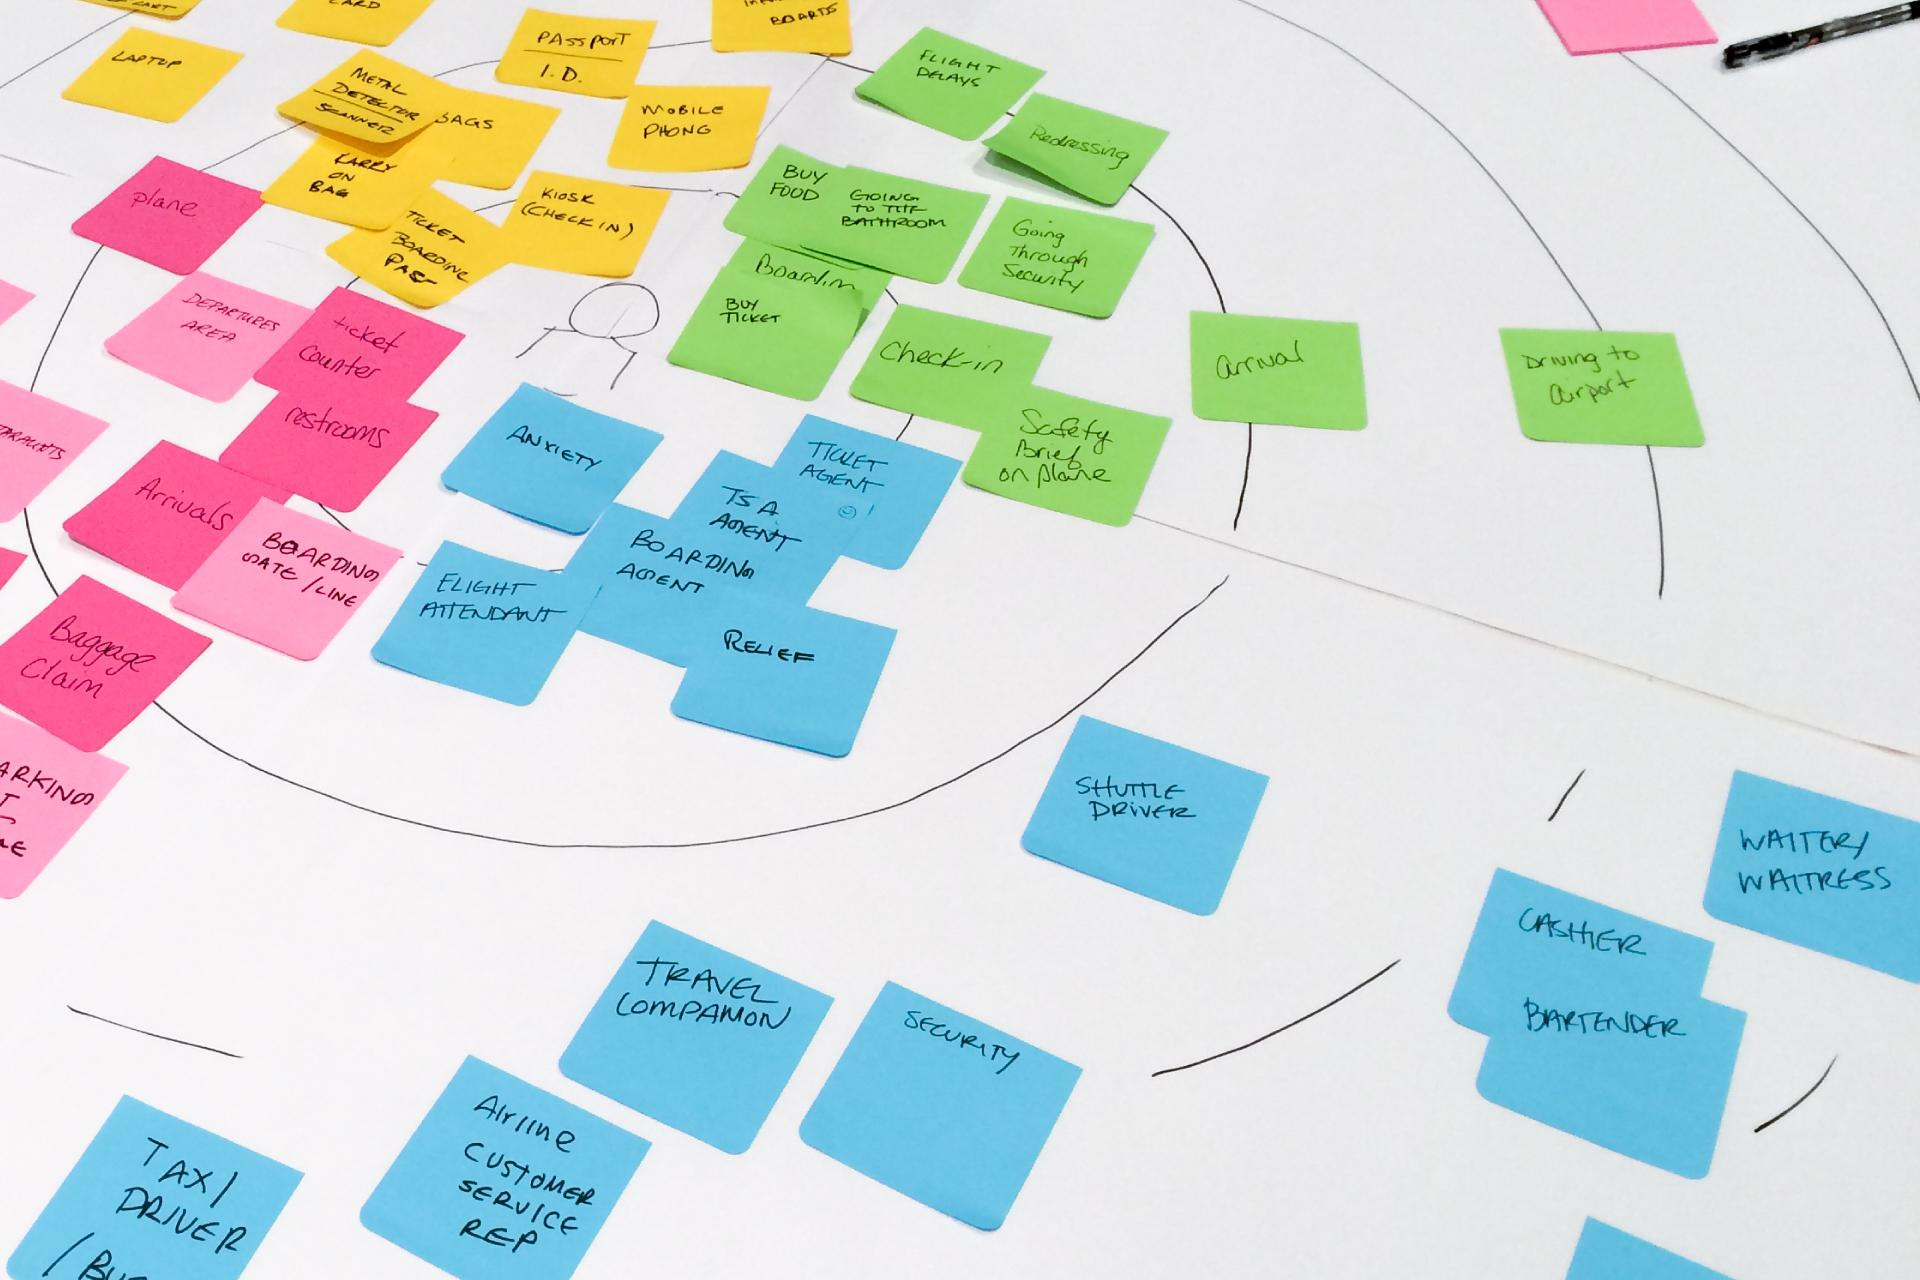 The human-centric design process.